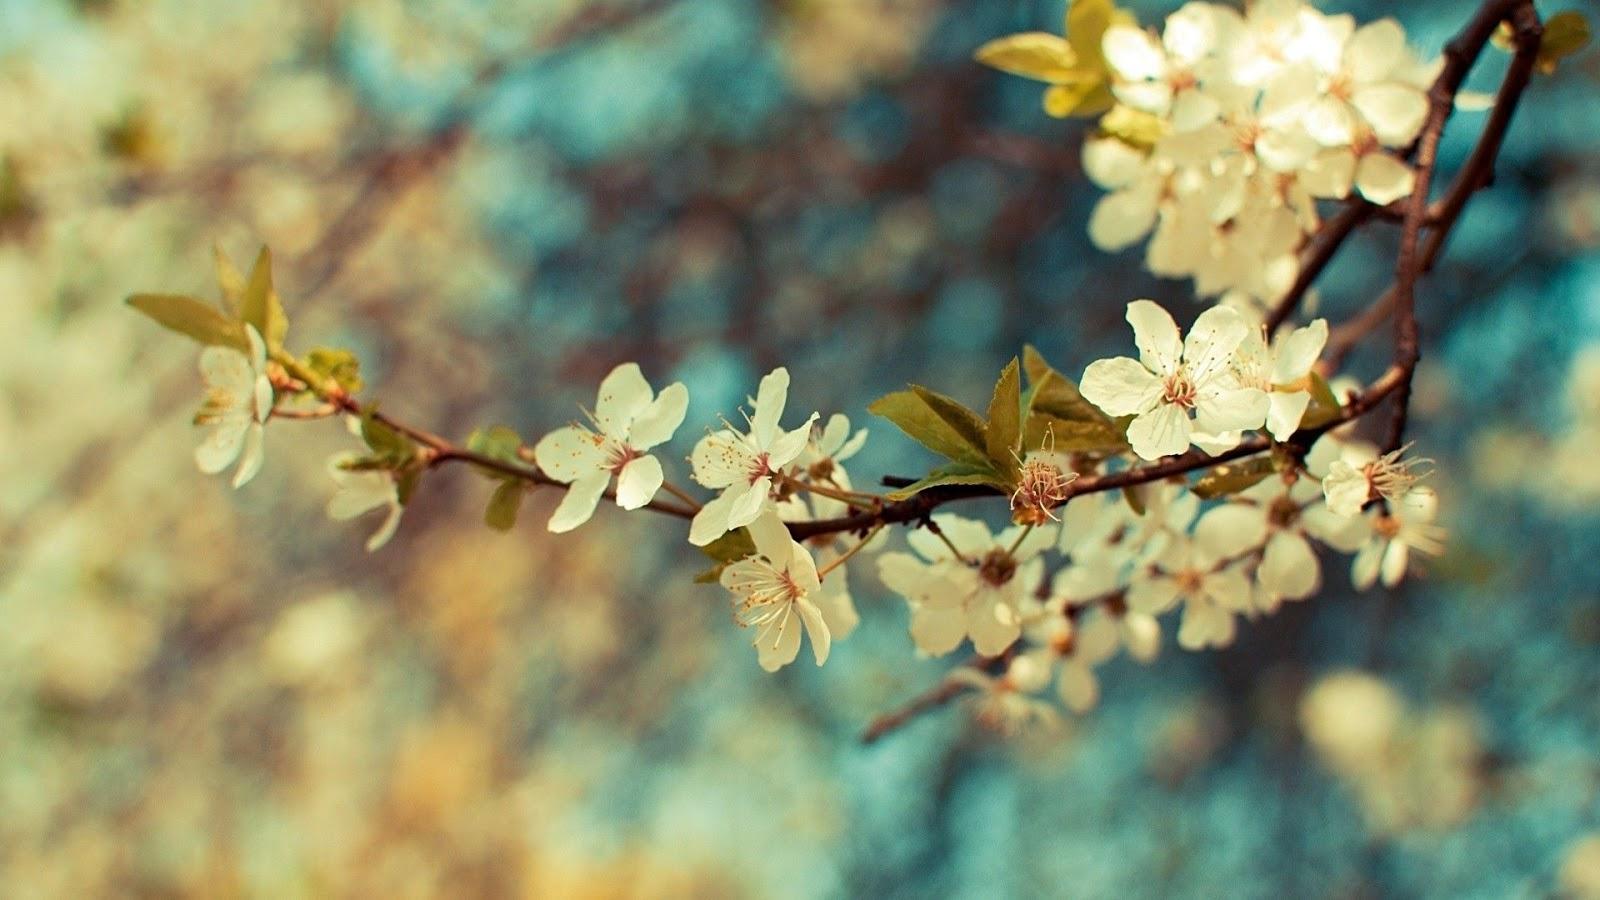 Feliz Dia De La Primavera Imagenes Gratis Para Facebook Pinterest